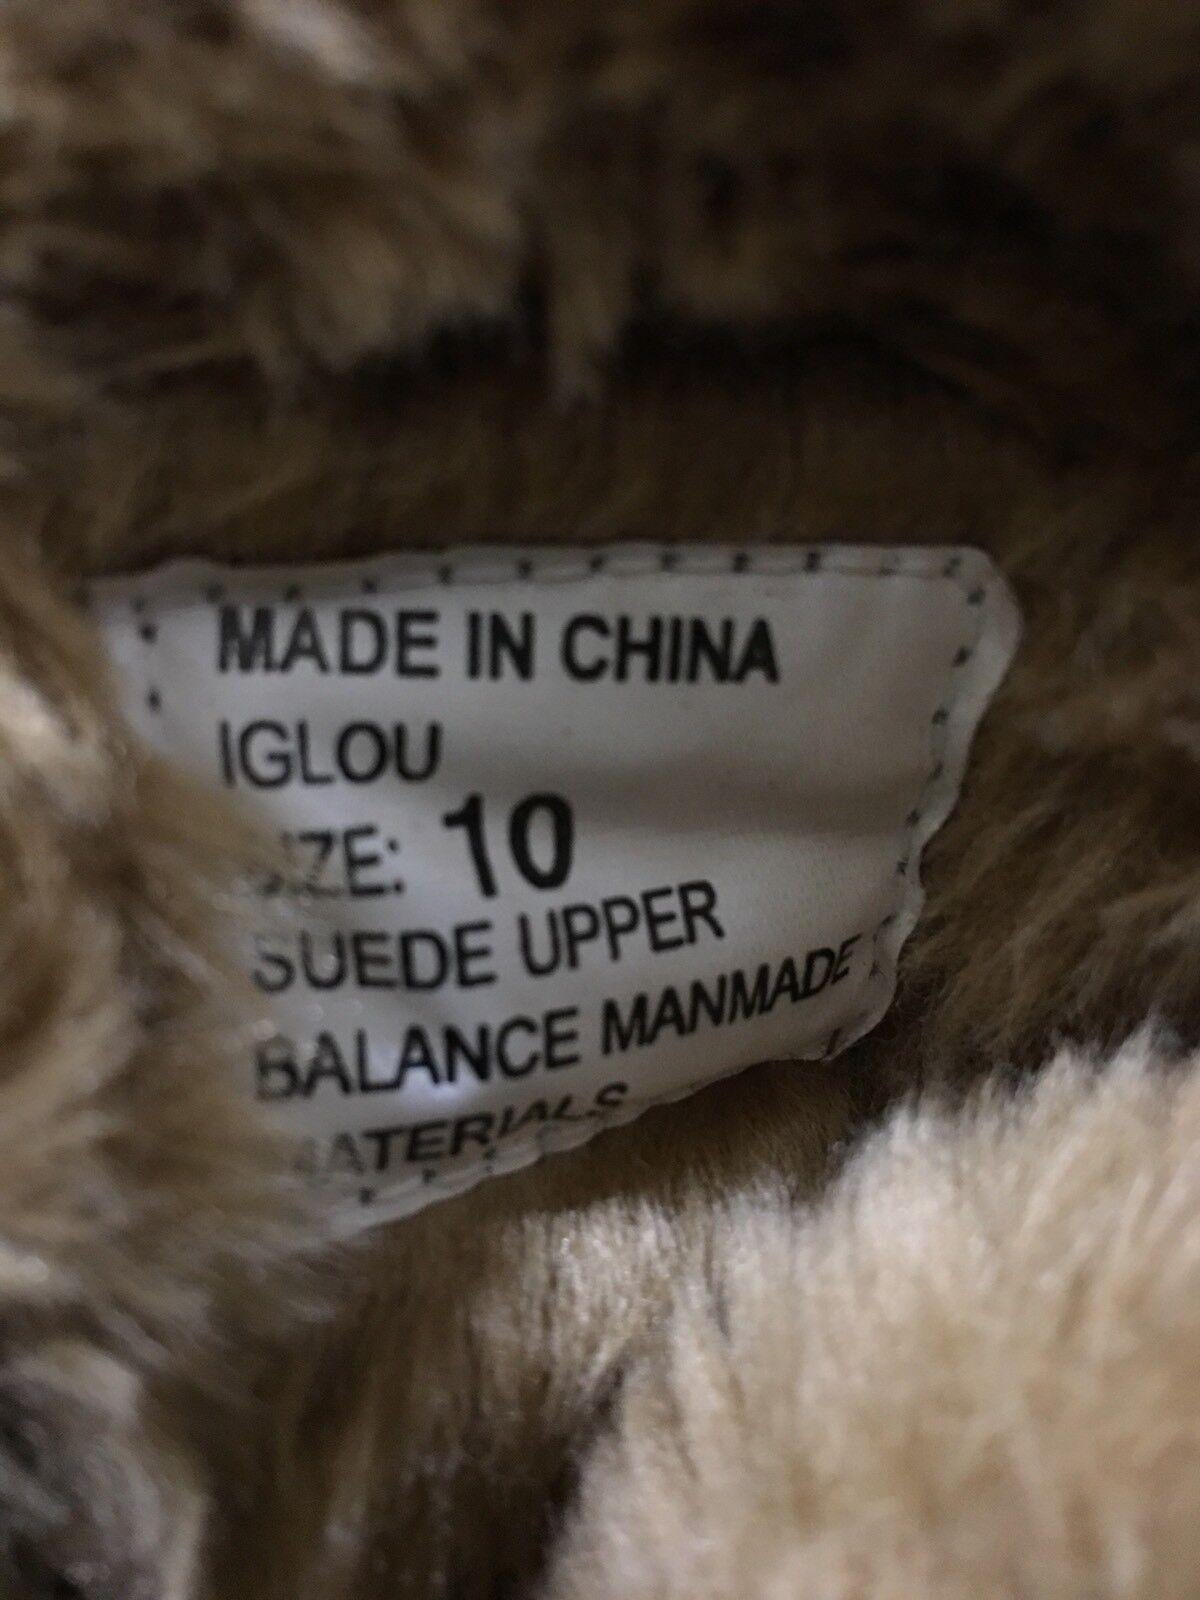 NEW Steve Madden Womens Womens Womens Tan Brown  Iglou Suede Faux fur Moccasin Boots Sz 10 d390e0